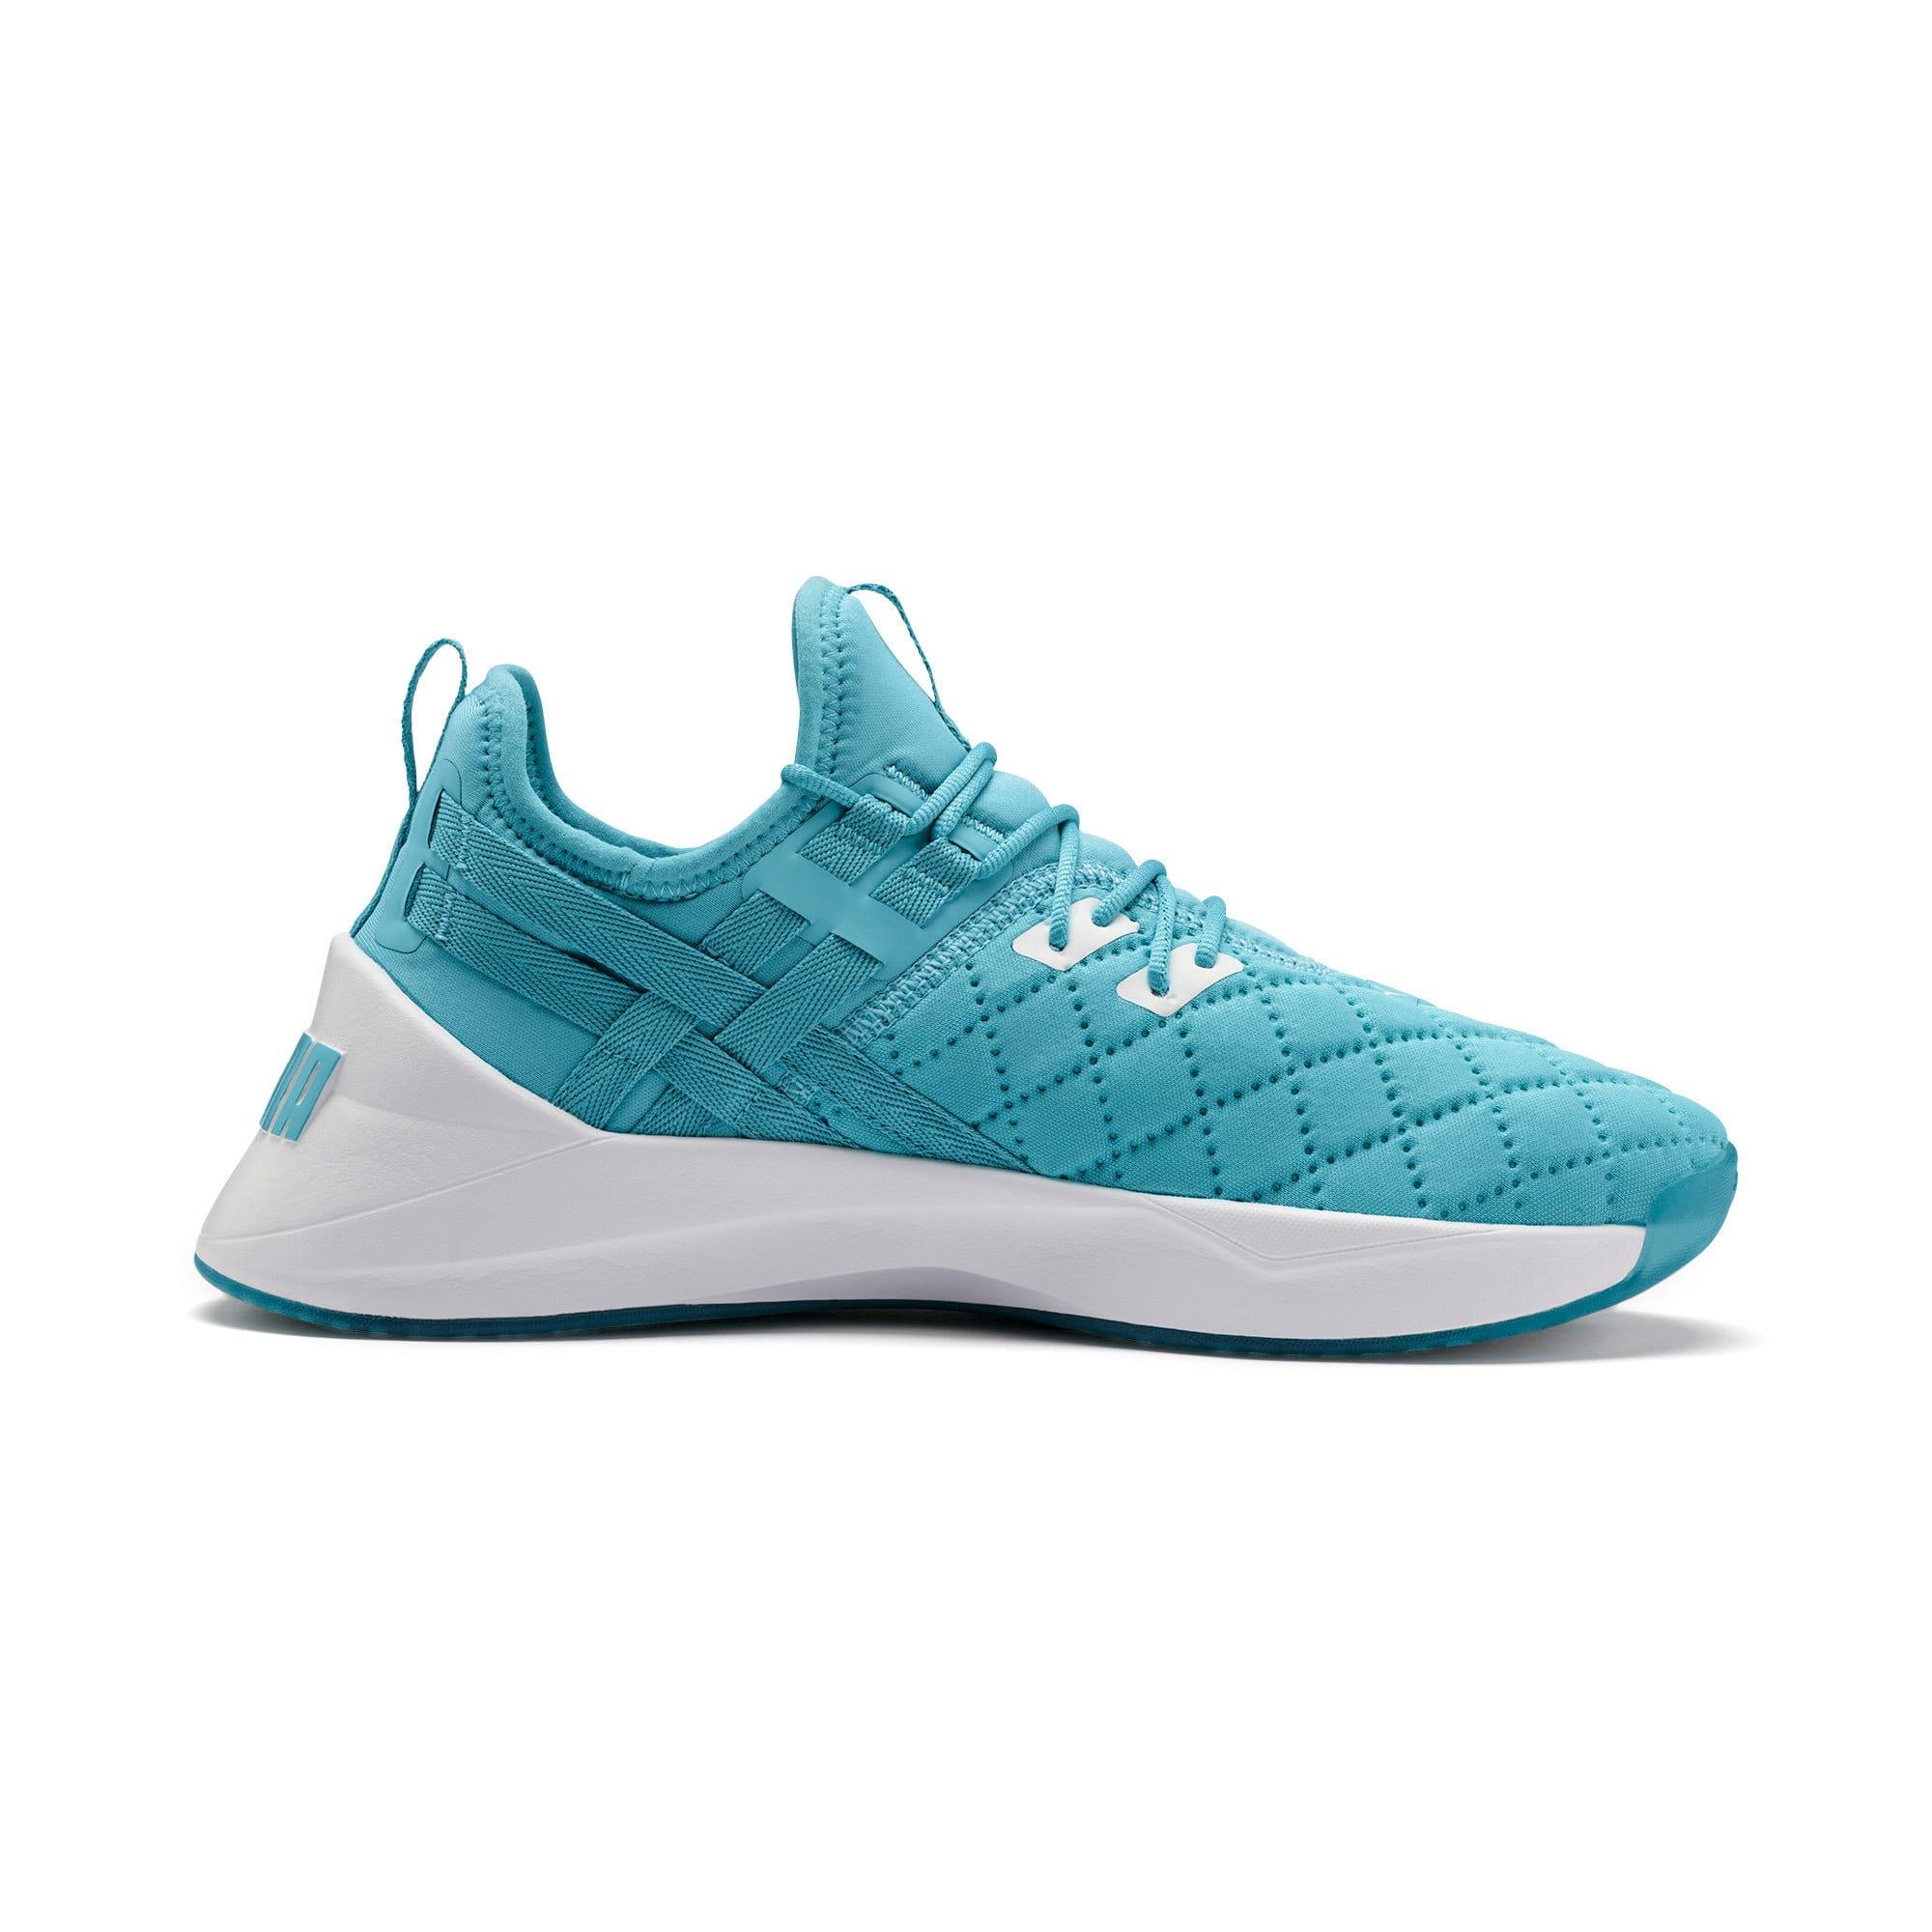 Thumbnail 6 of Jaab XT Quilt Women's Training Shoes, Milky Blue-Puma White, medium